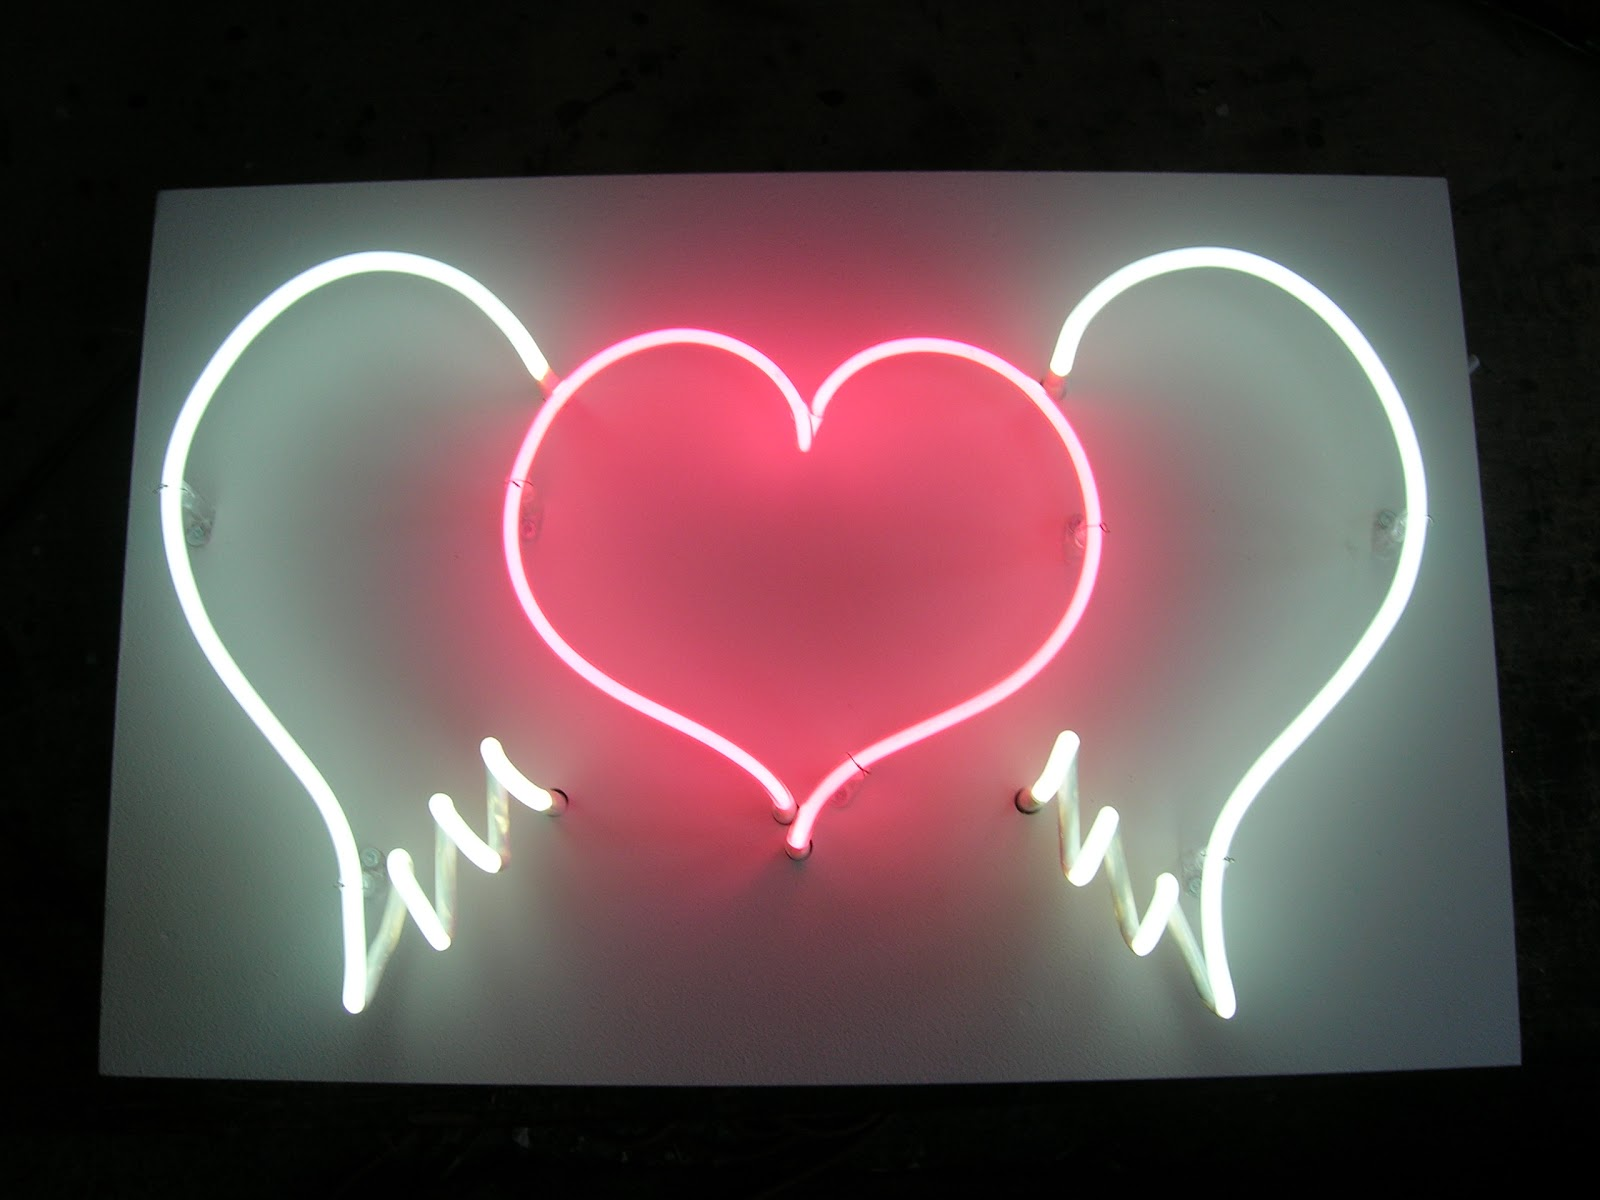 http://4.bp.blogspot.com/-2ehokjP1eIY/To9vkHbMn5I/AAAAAAAAAUg/ynxR0R7cBTg/s1600/neon%2Blove%2Bheart%2Bwith%2Bwings.JPG